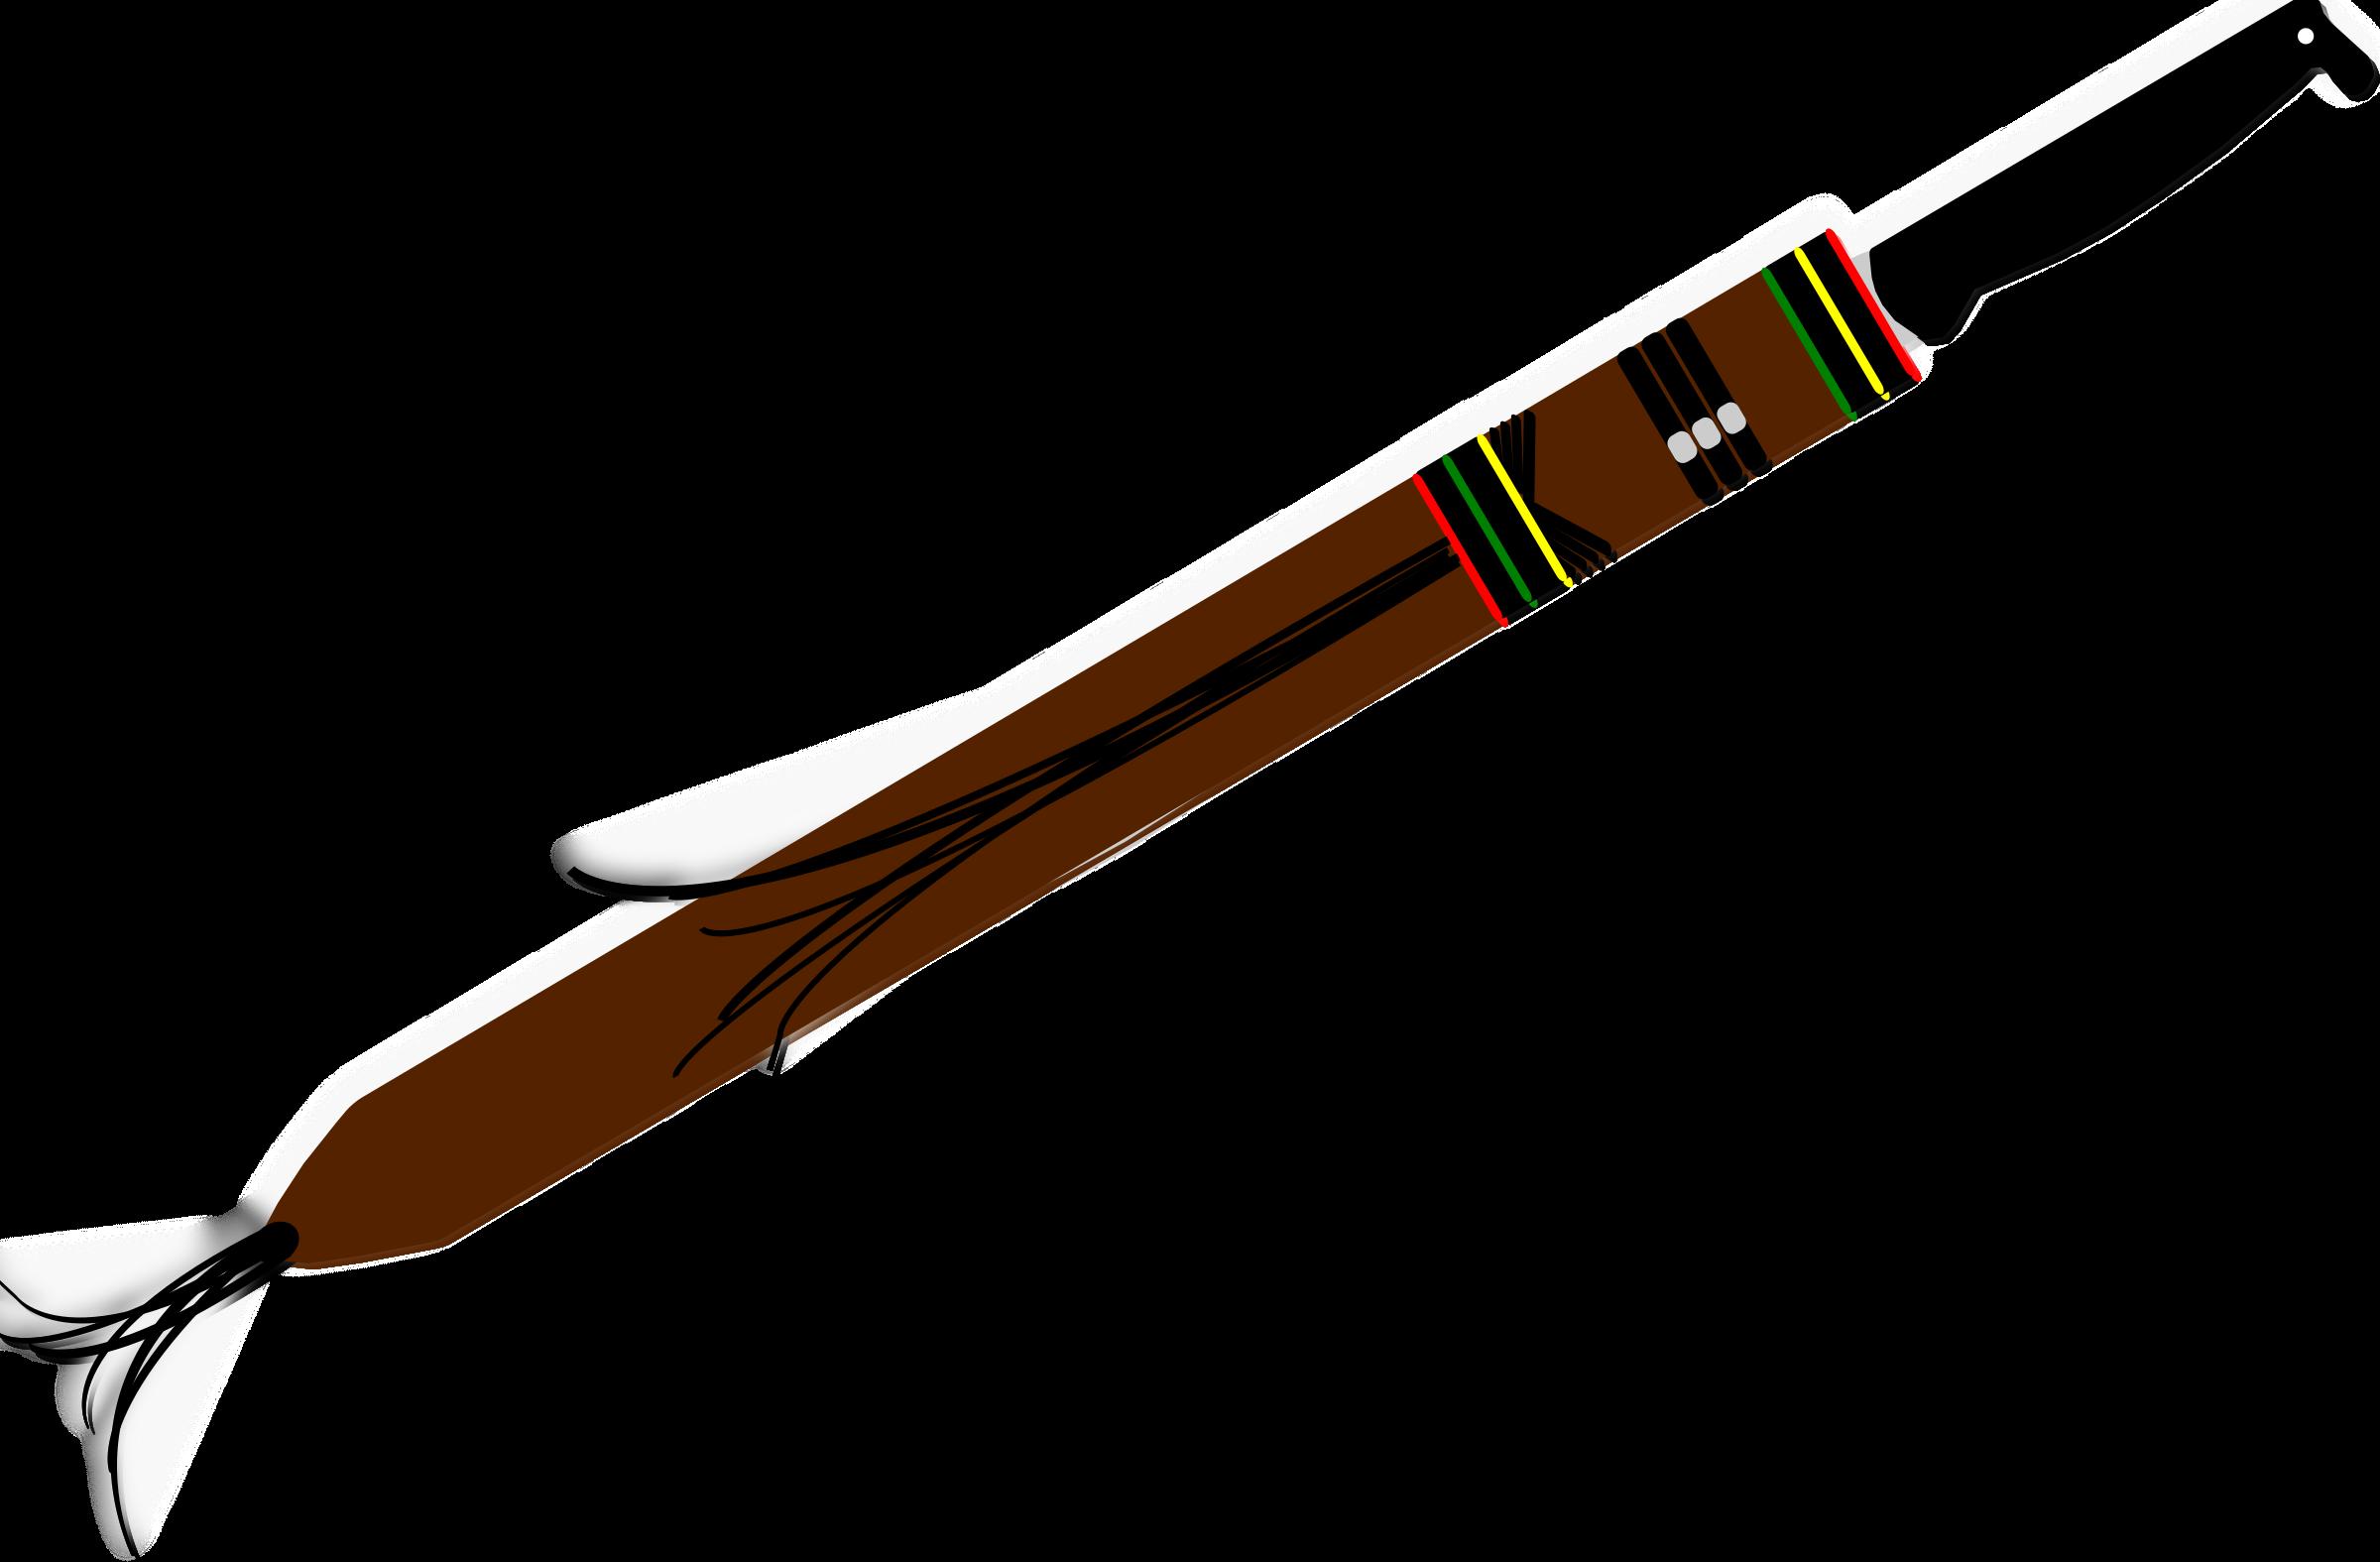 Clipart sword machete. Colombian big image png